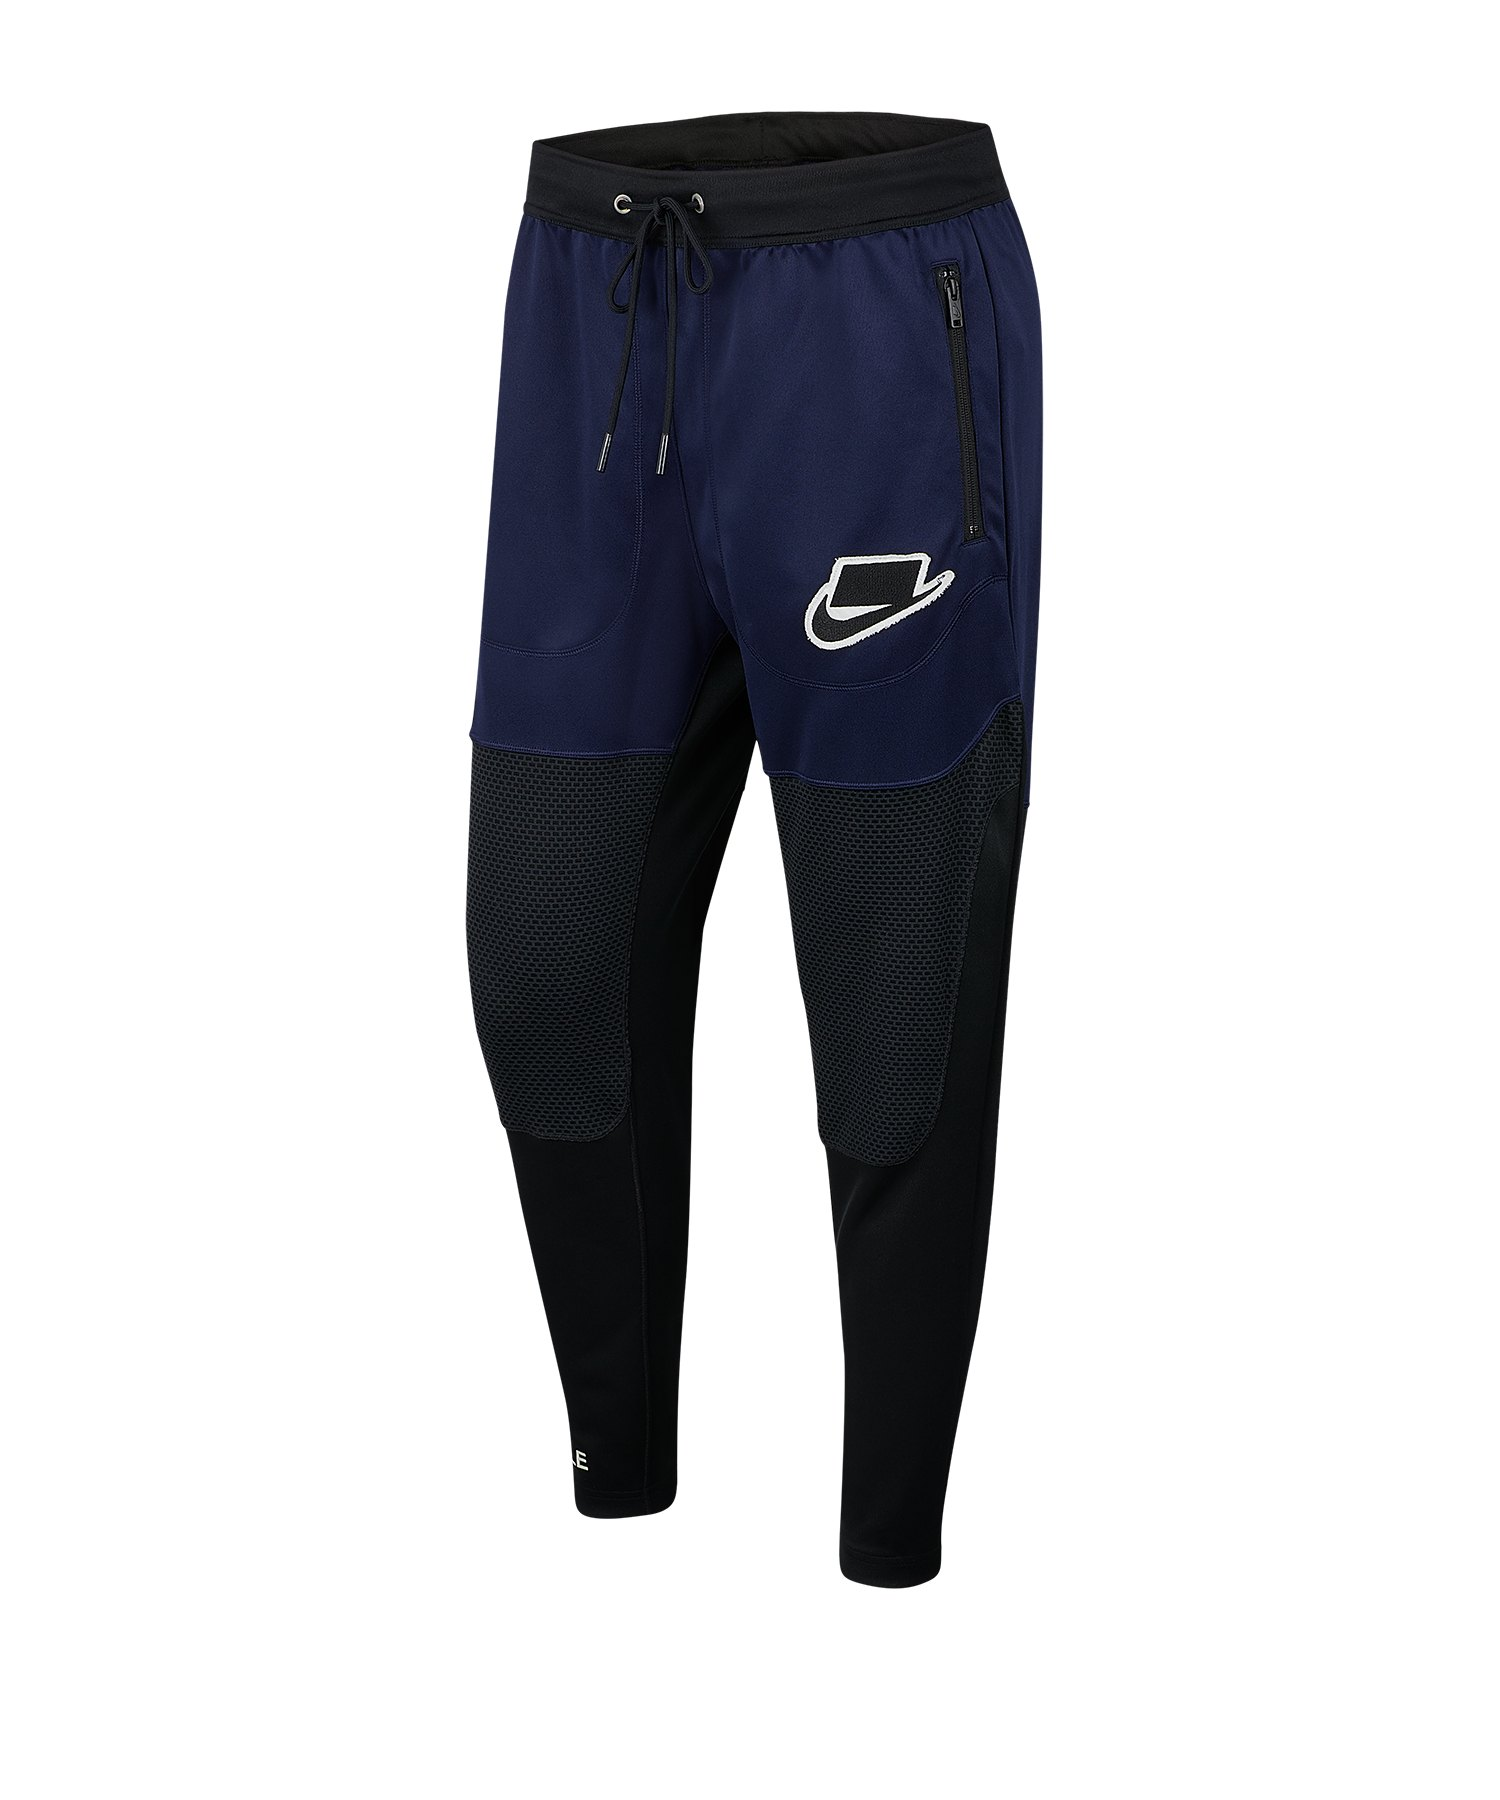 Nike Track Pants Trainingshose Blau F498 - blau